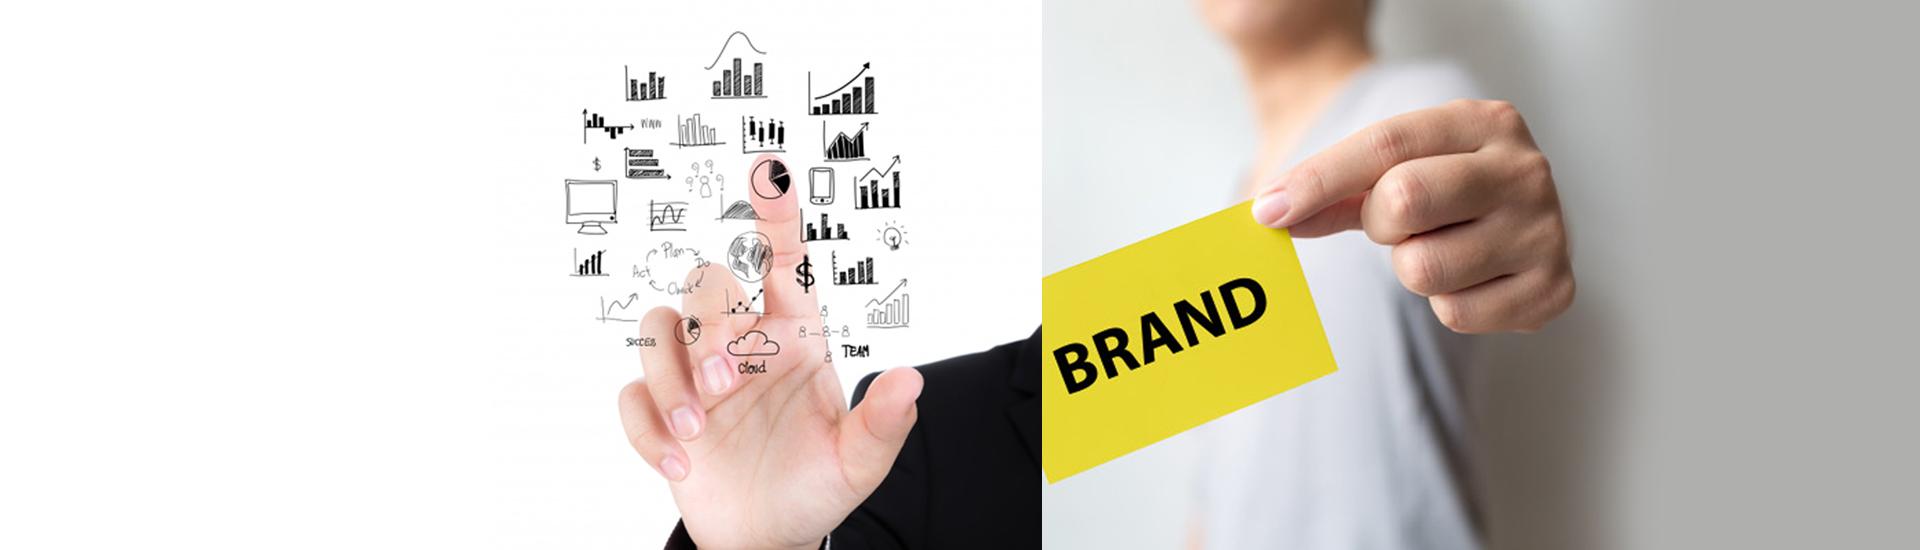 Managing Brand Reputation in the Social Media